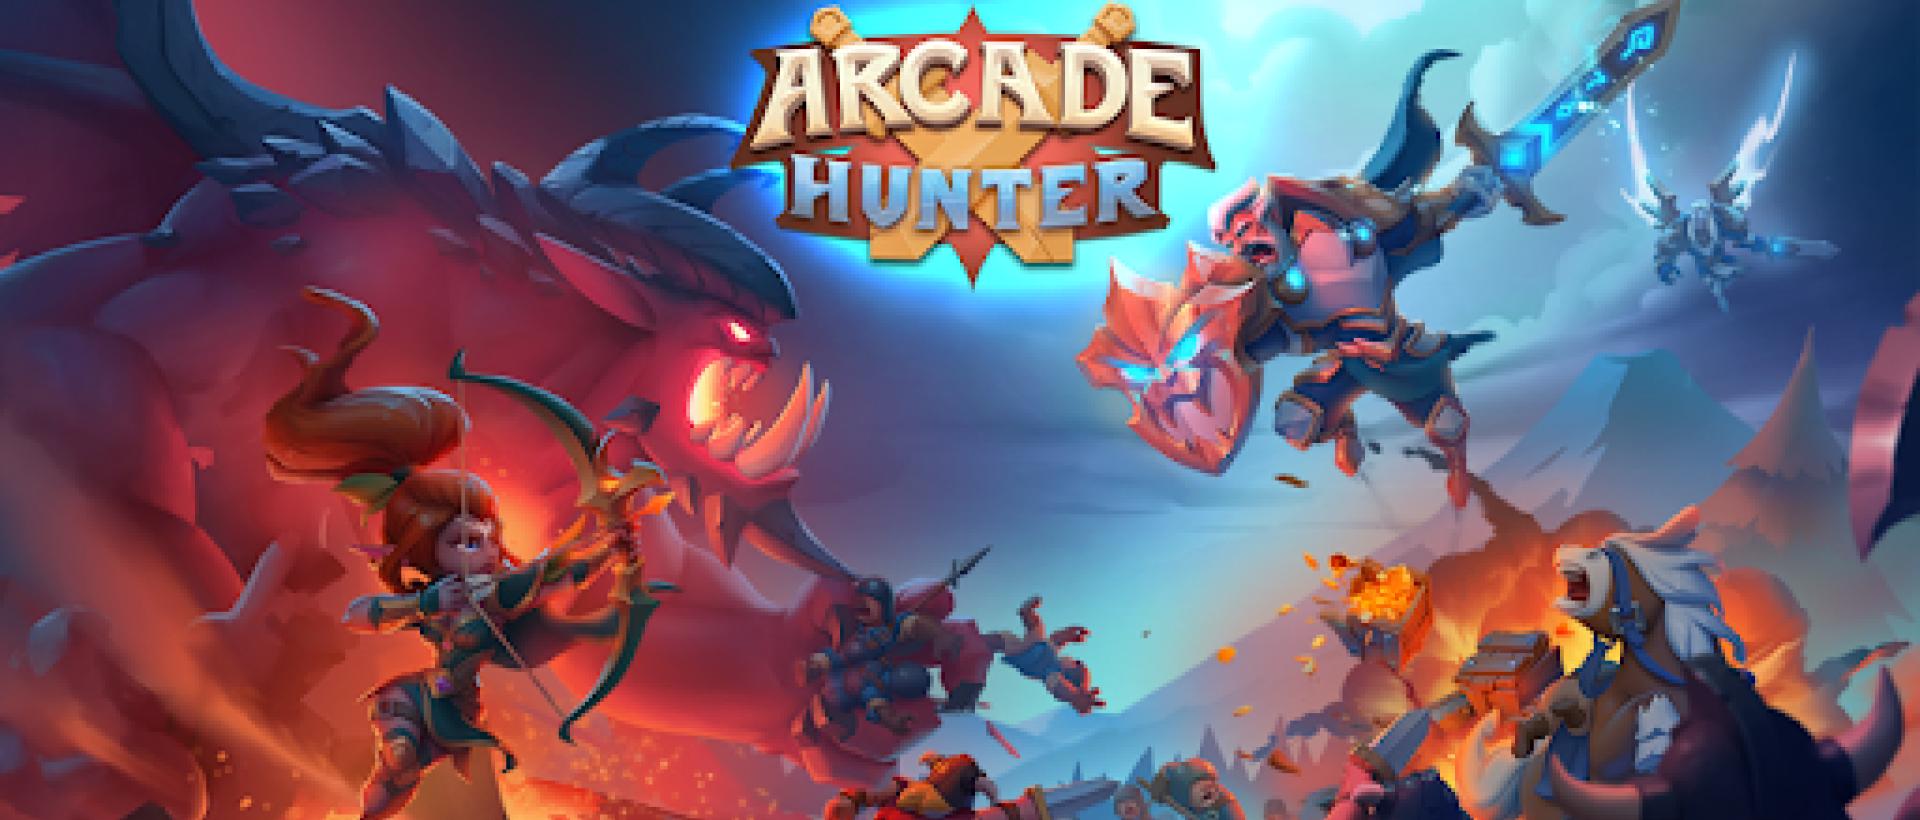 Arcade Hunter: Sword, Gun, and Magic